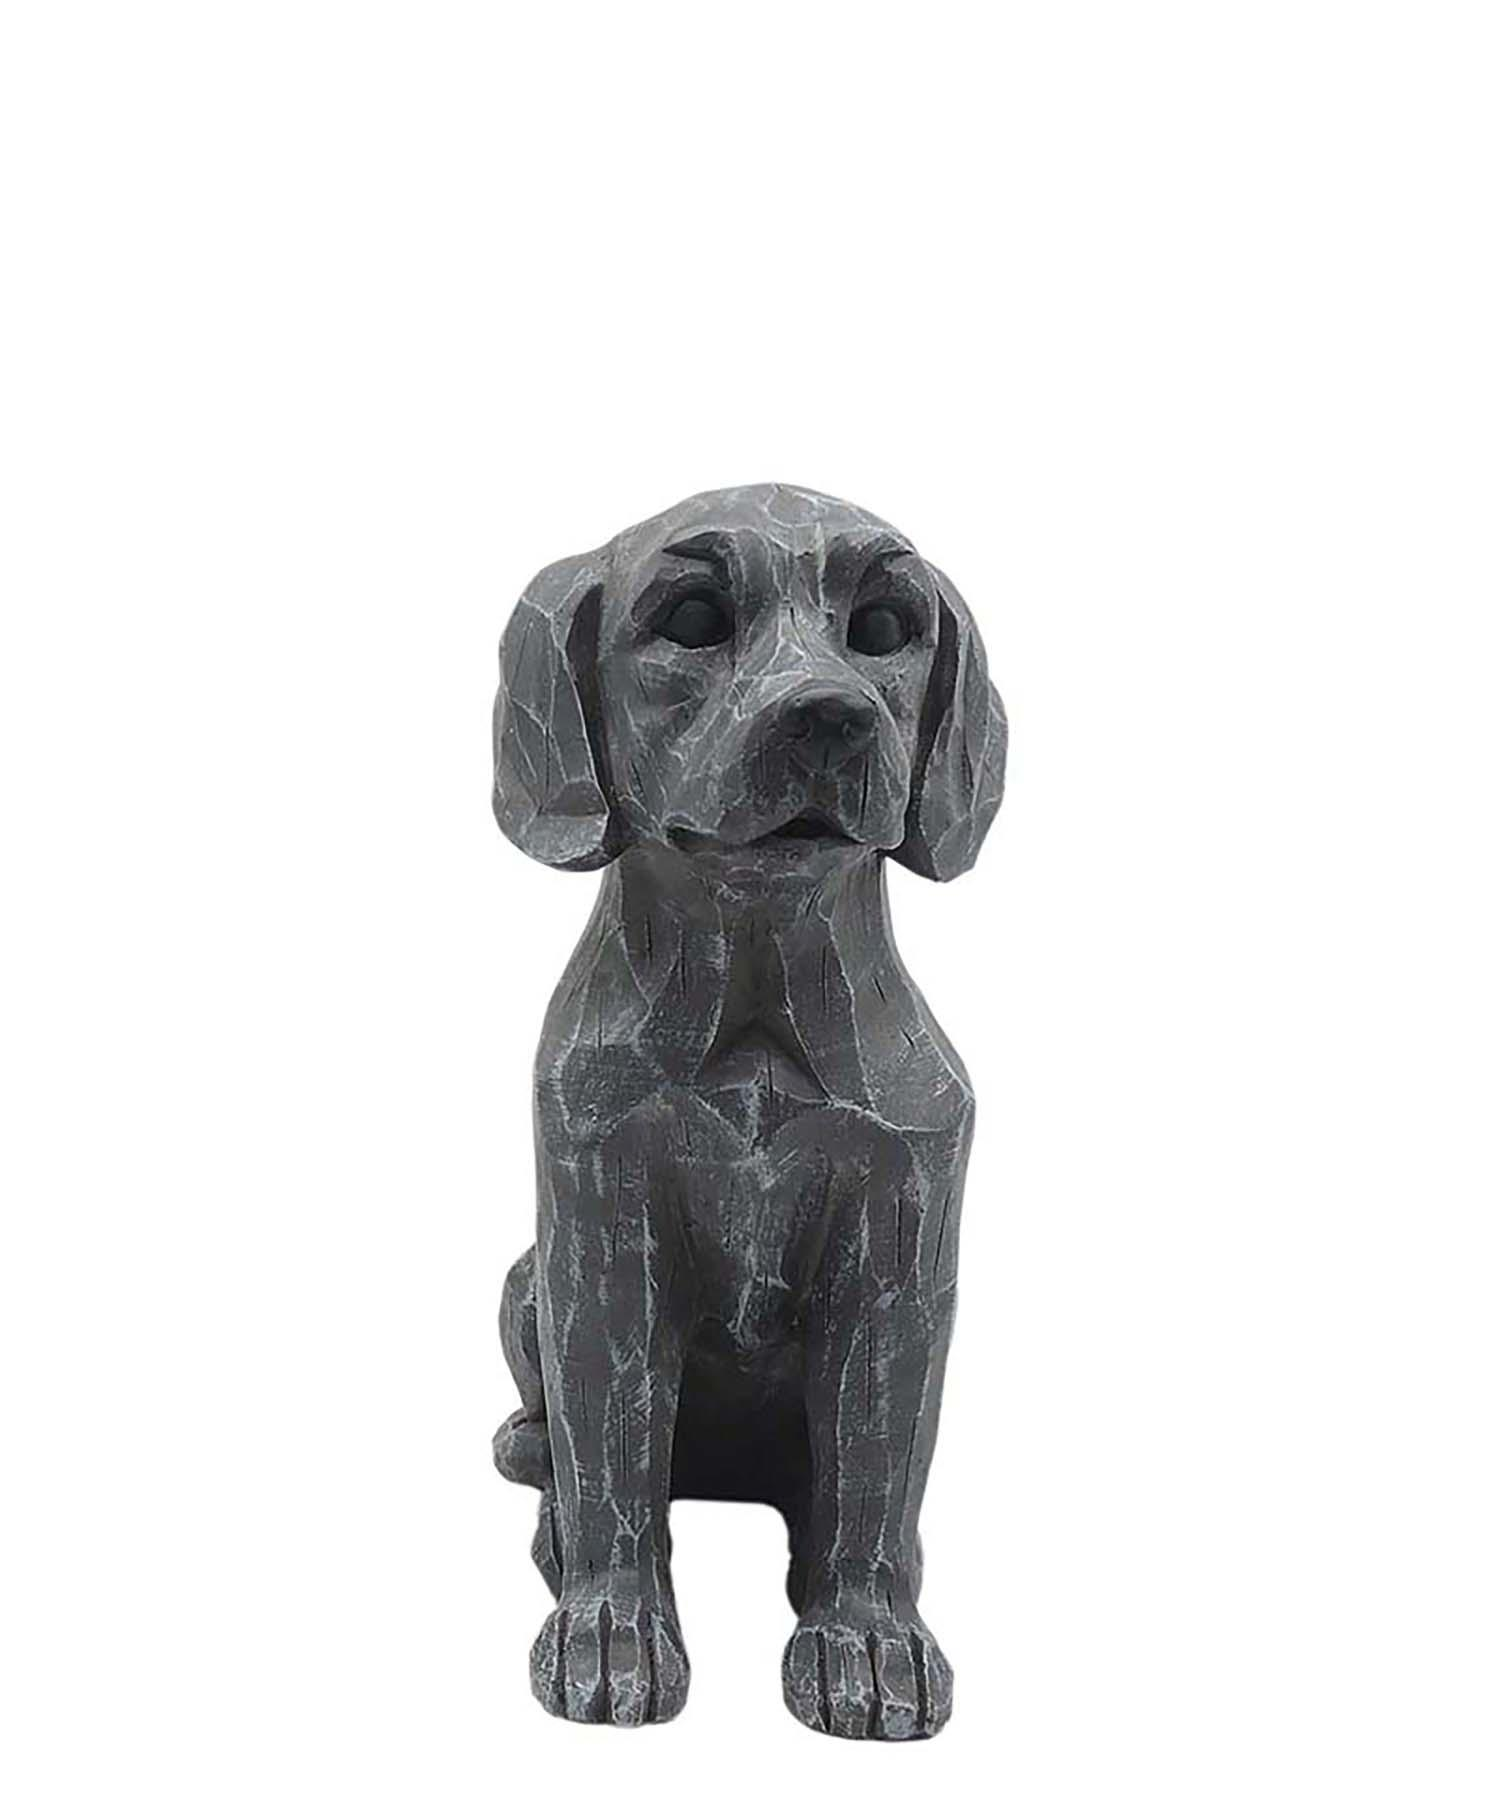 Light Grey Resin Dog  Kawai Garden Decoration  PH15810